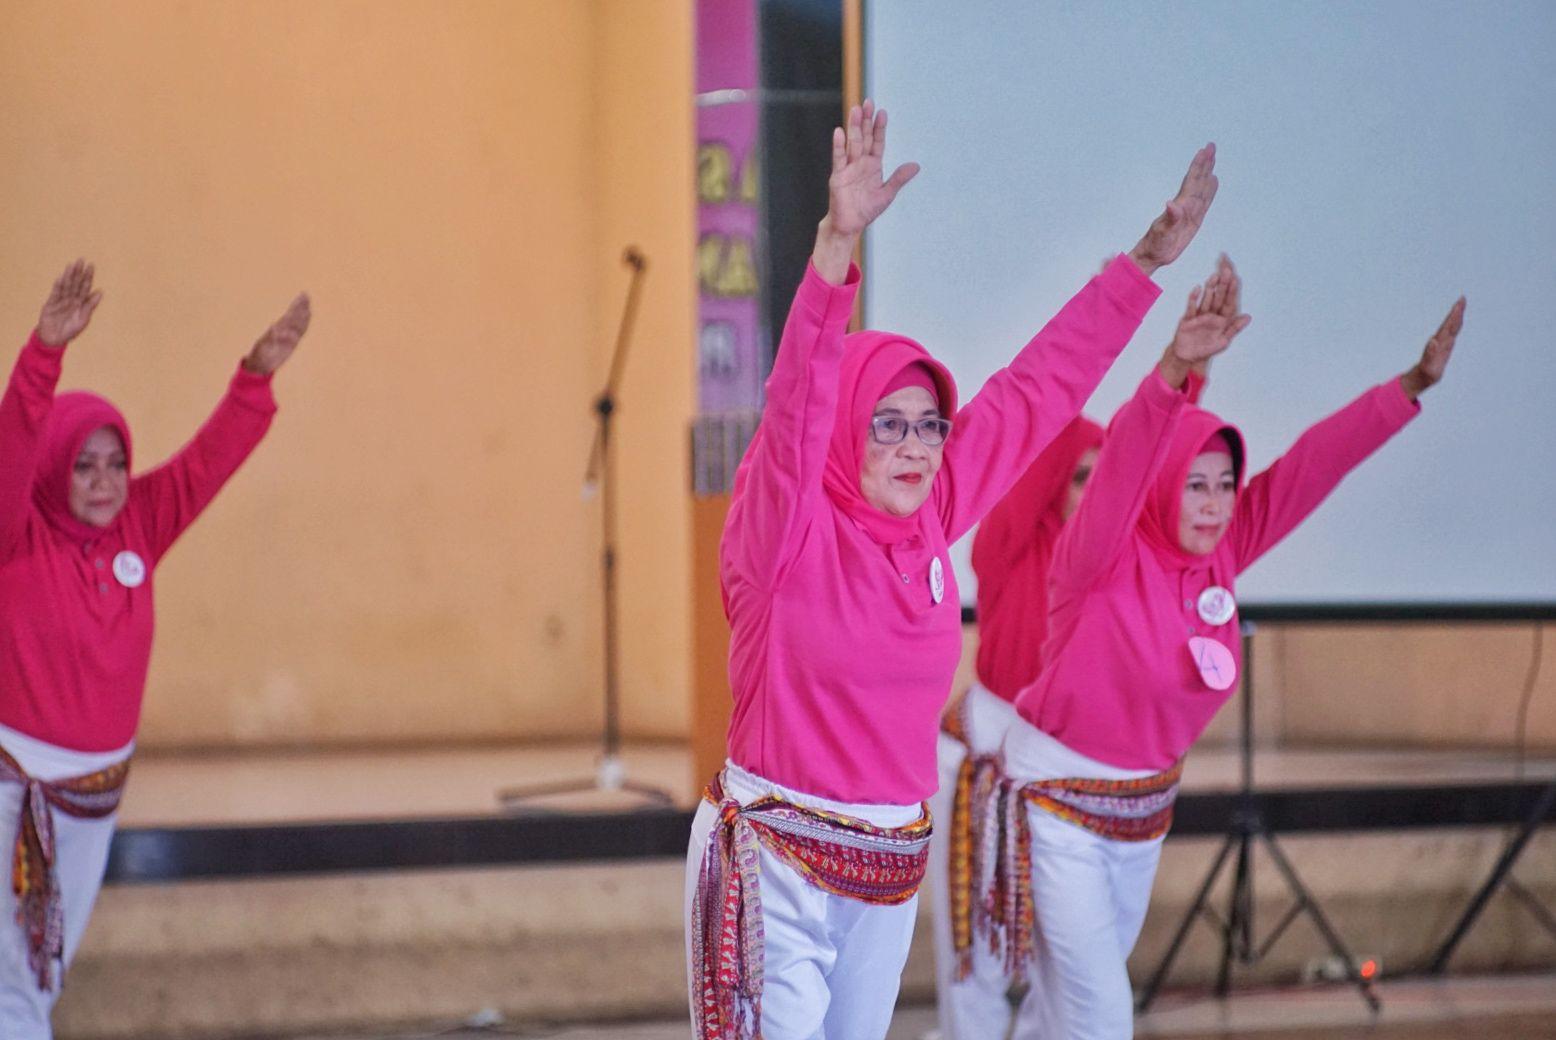 Festival Senam Komunitas Kebugaran Lansia Pra-lansia Indonesia (KLPI) Ajak Lansia Sehat, Bugar  dan Poduktif